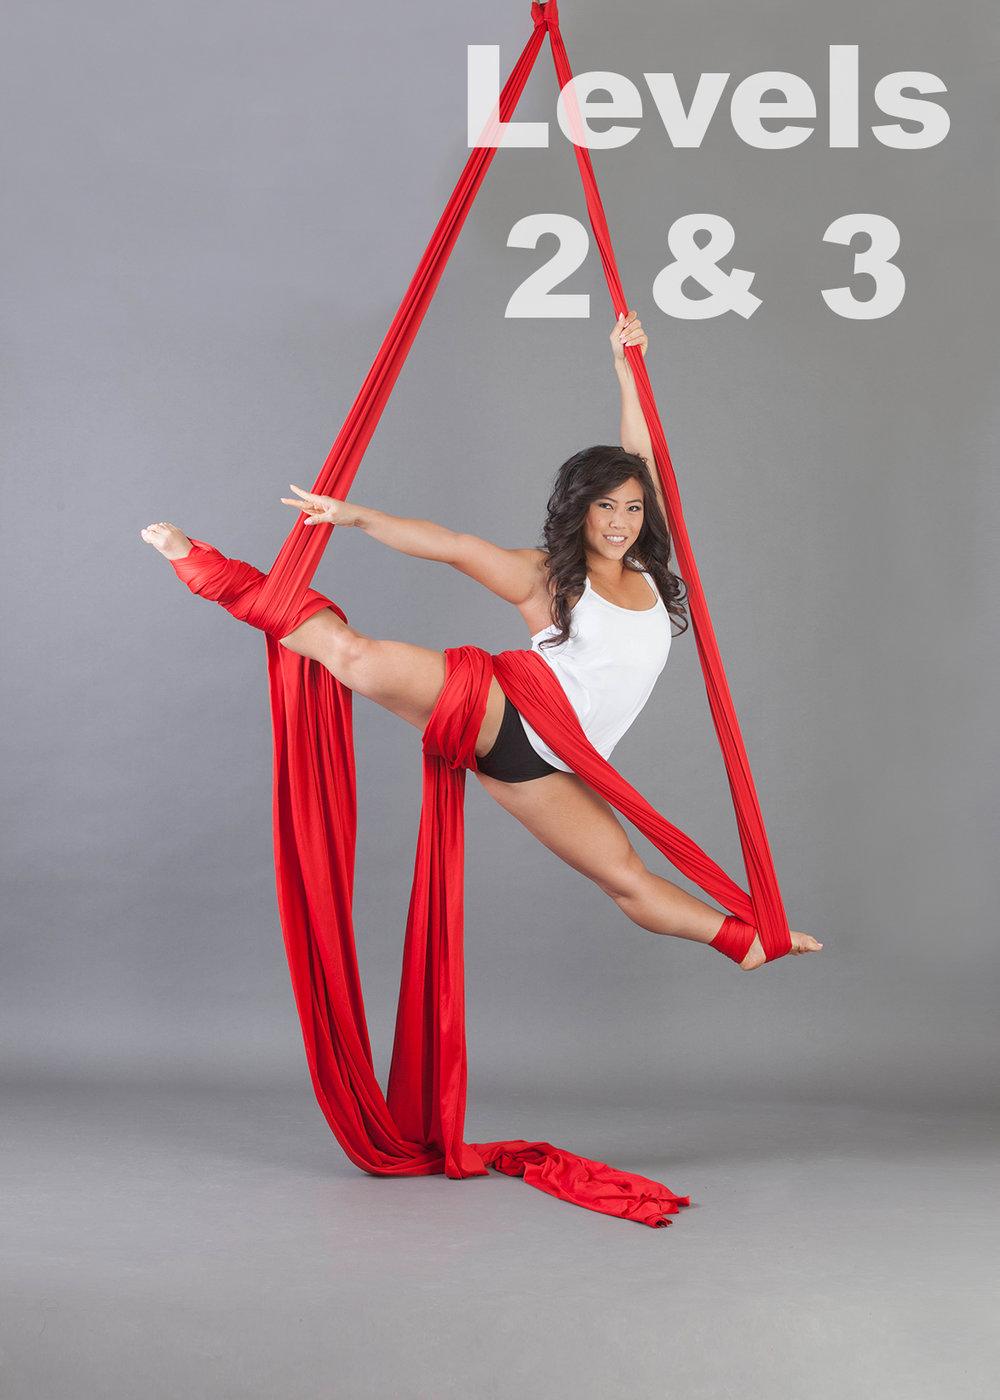 Silk Level 2 and 3.jpg